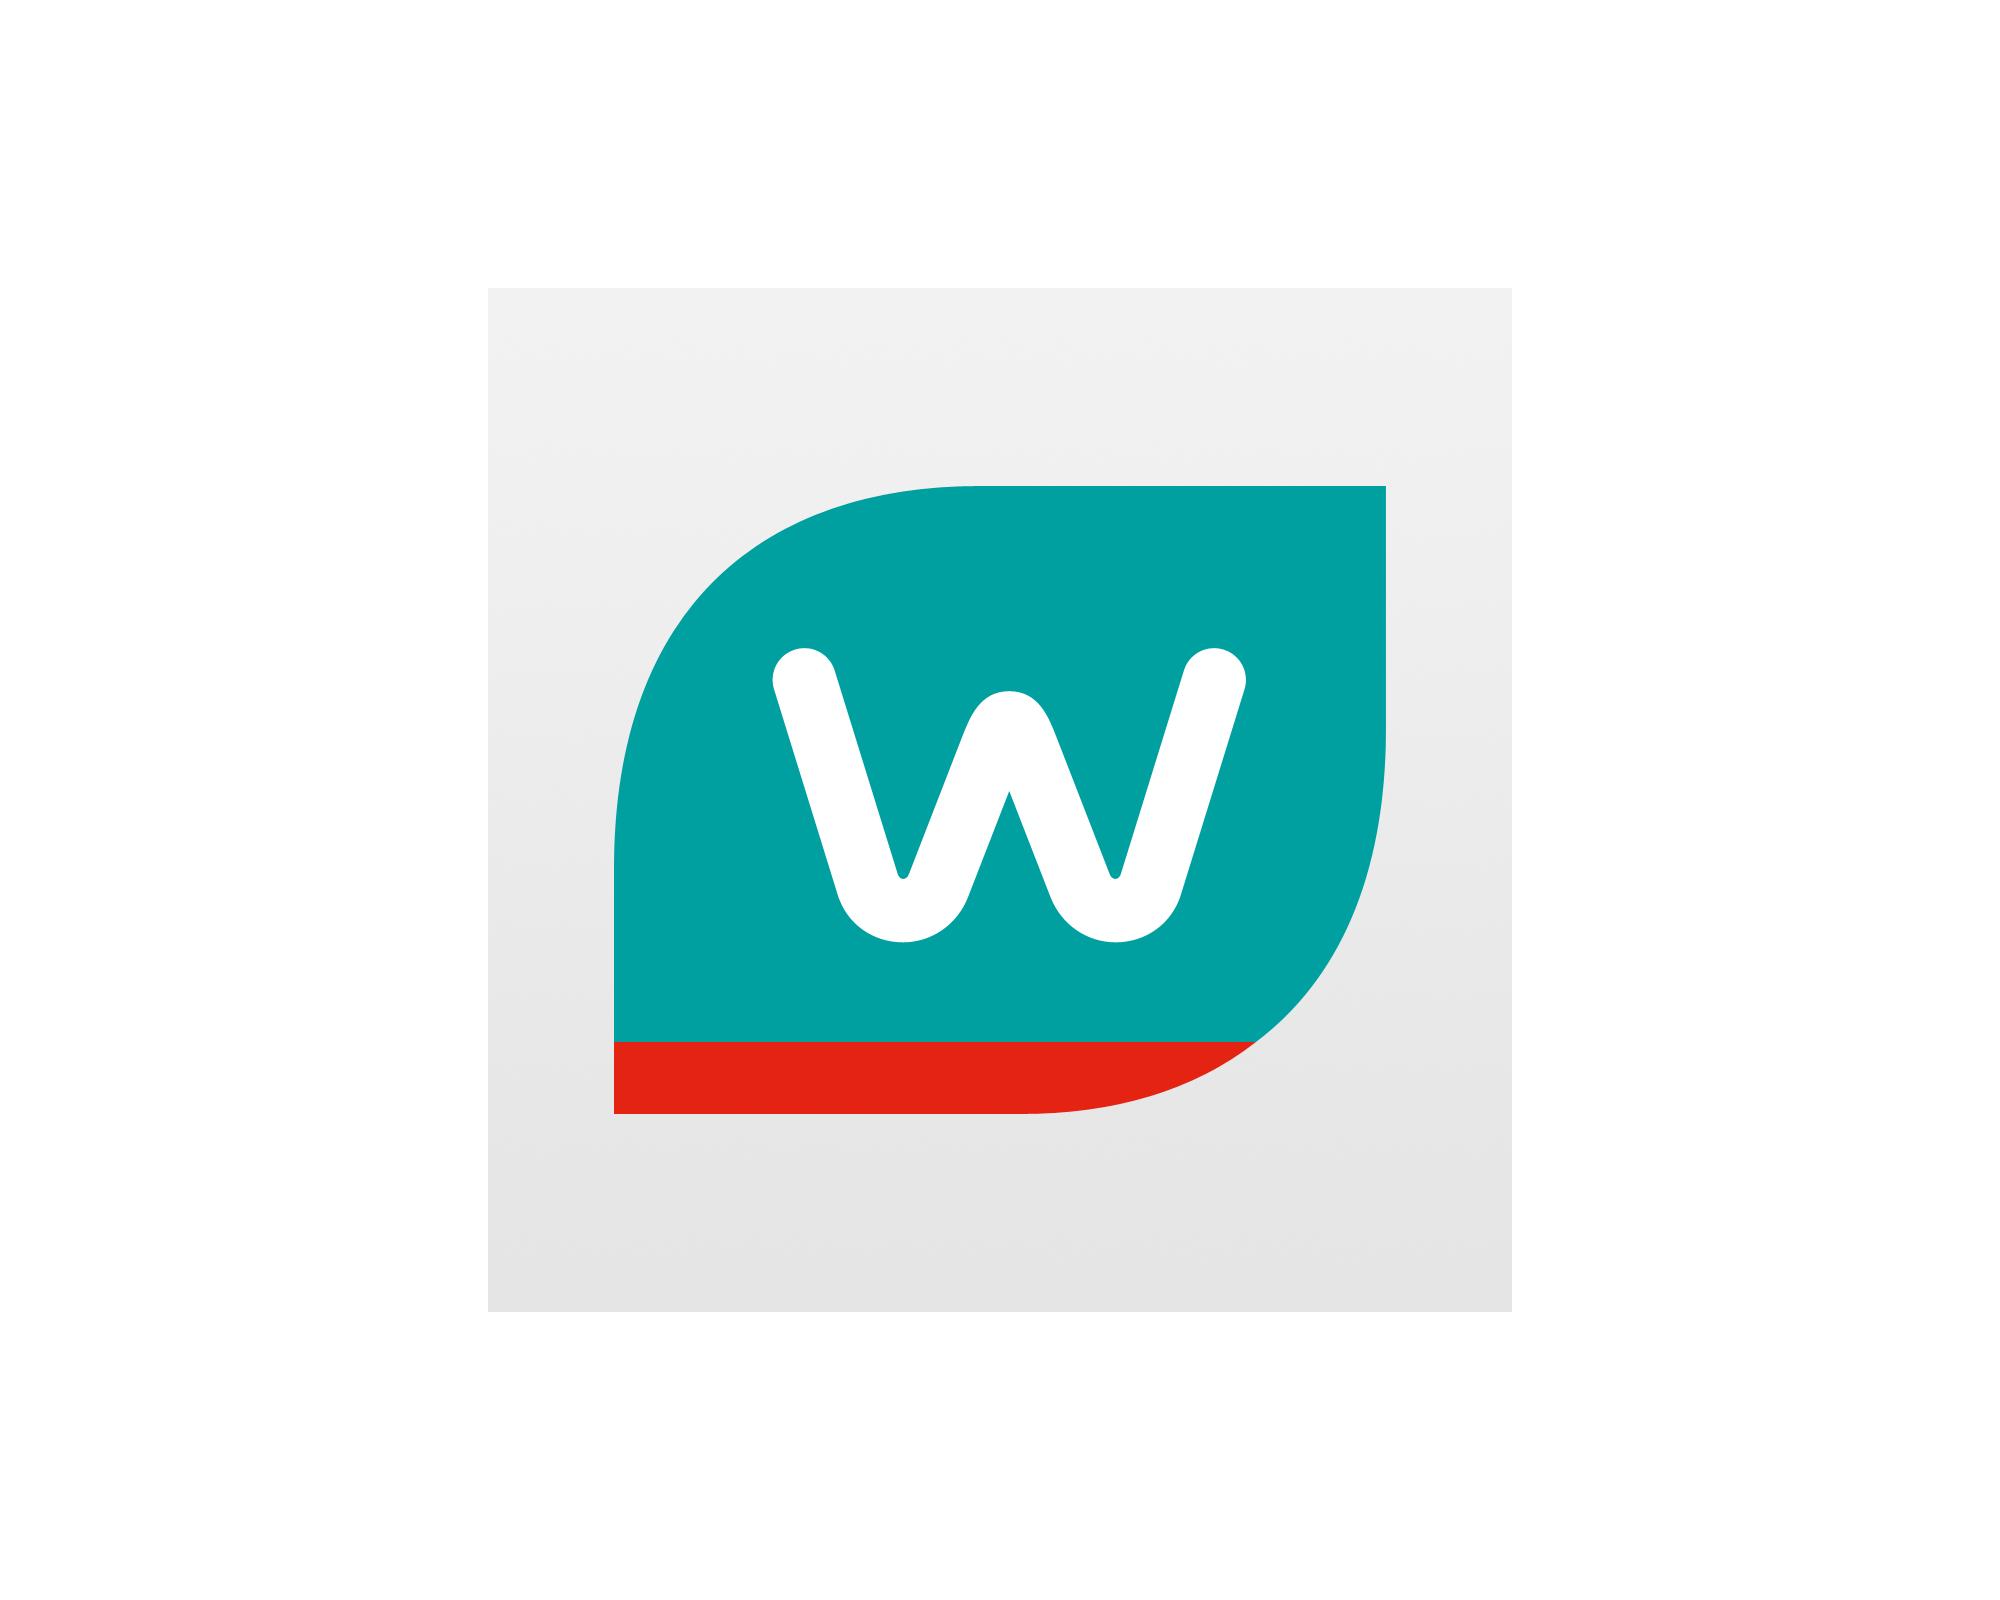 Download Logo Watson Retail Ibm PNG Image High Quality HQ.